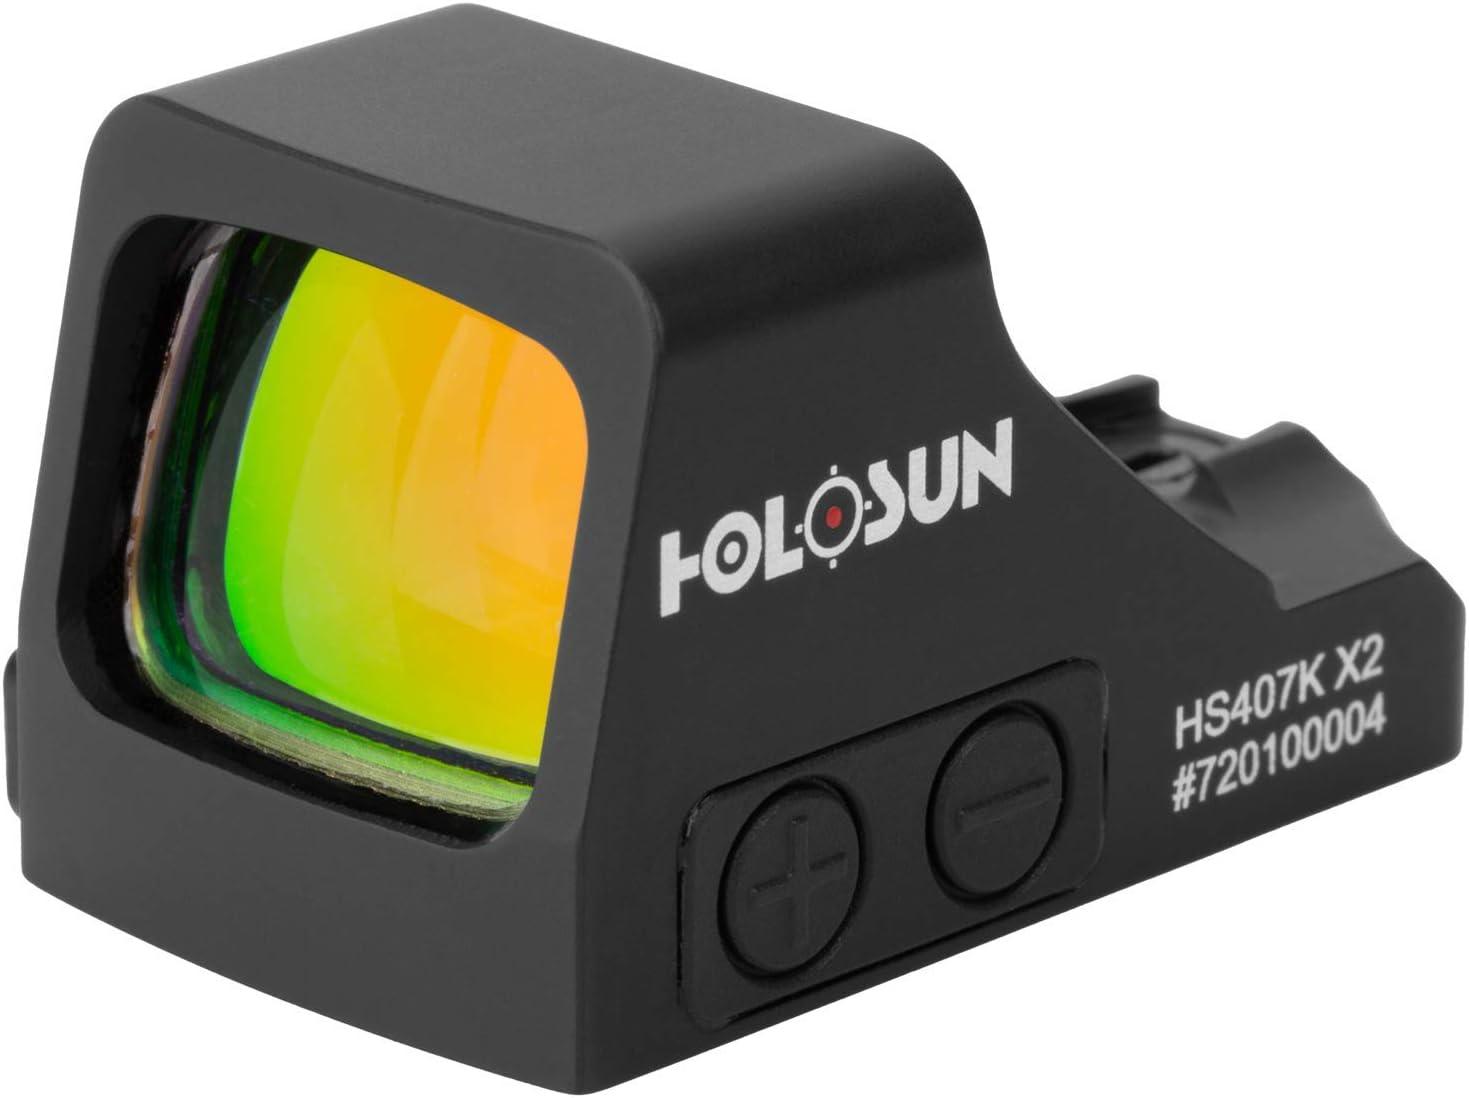 HOLOSUN 送料無料お手入れ要らず - HS407K-X2 メーカー再生品 Classic Open Reflex Red Sight MOA Dot 6 dot